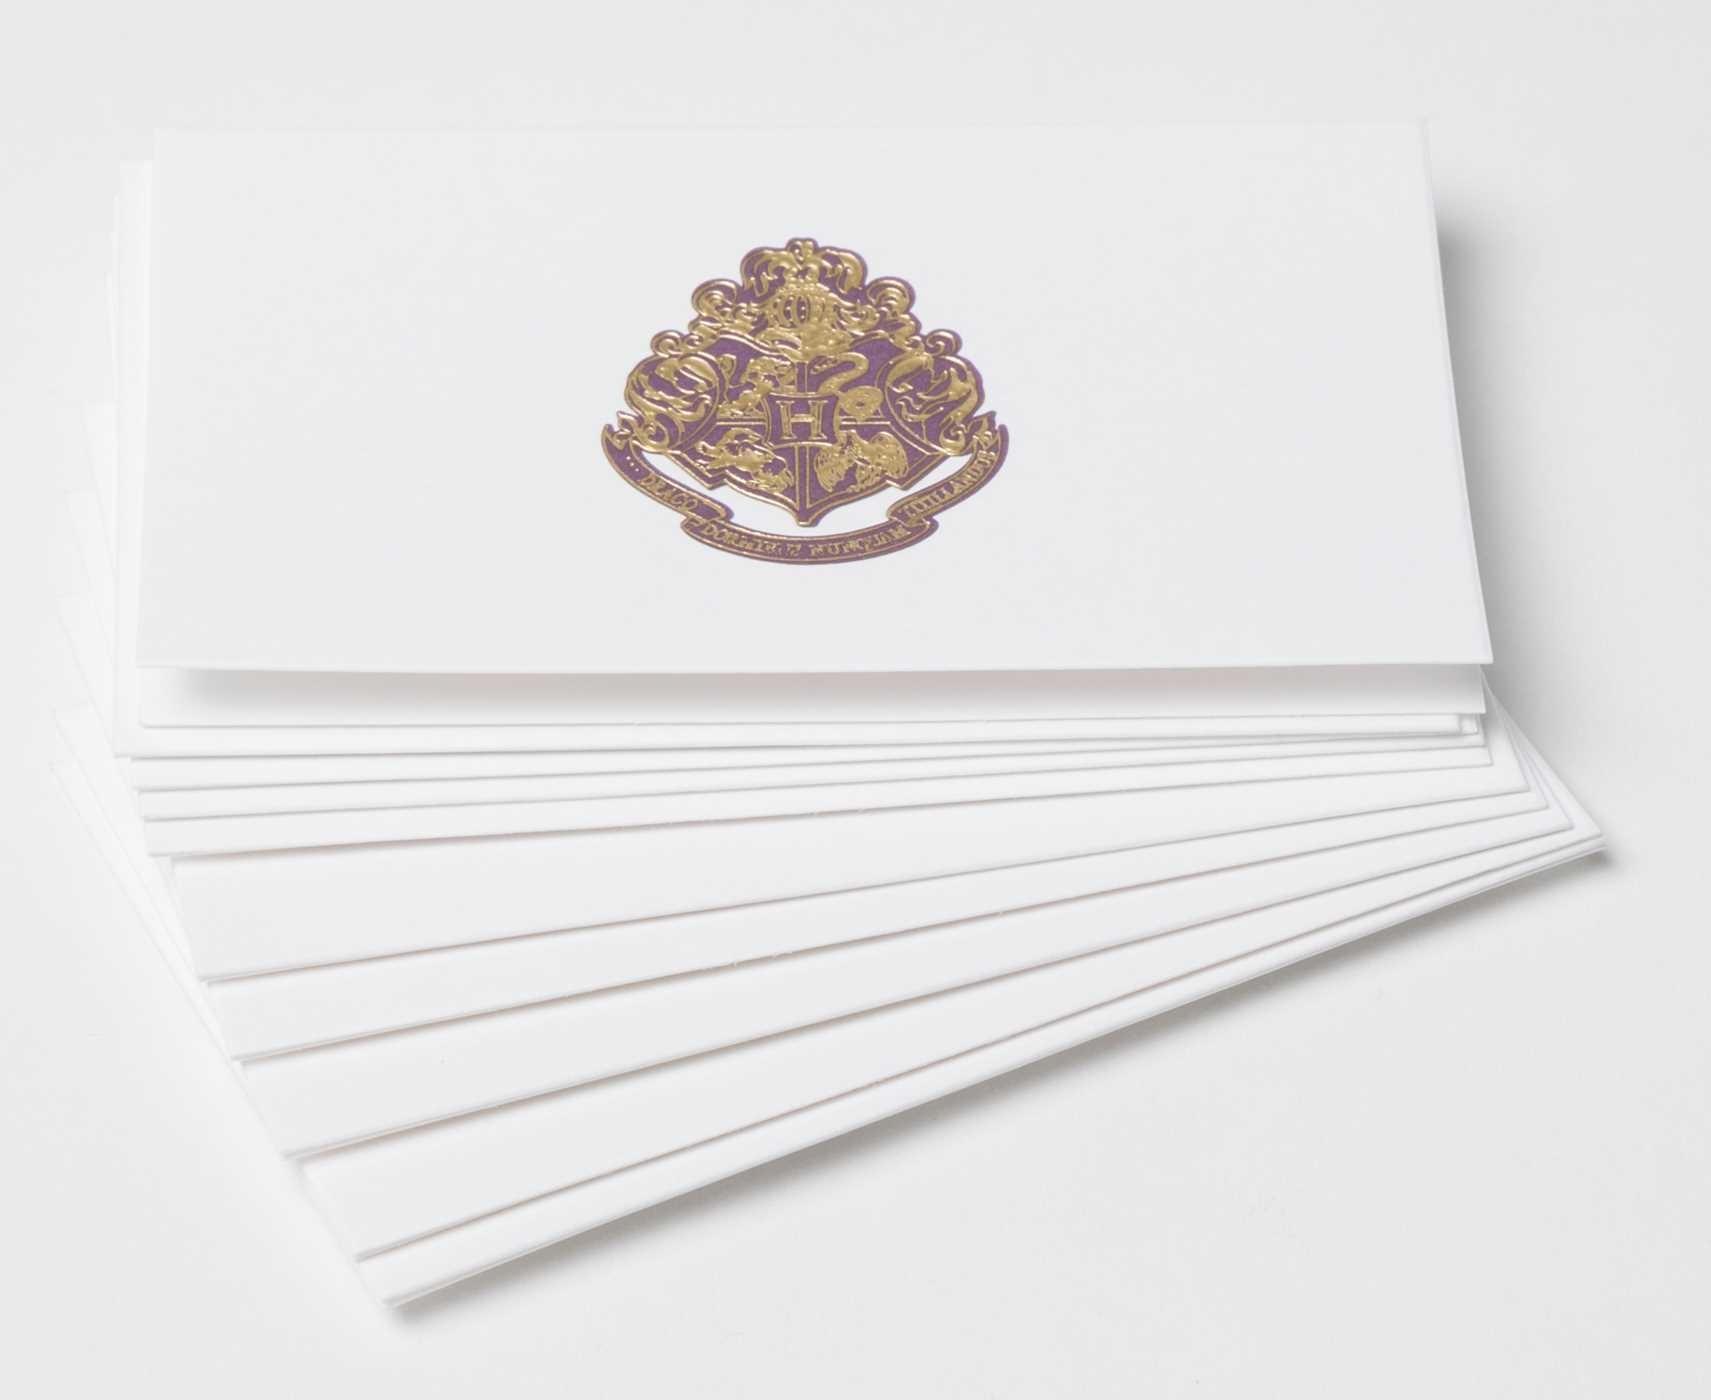 Set of 10 Enclosure Cards